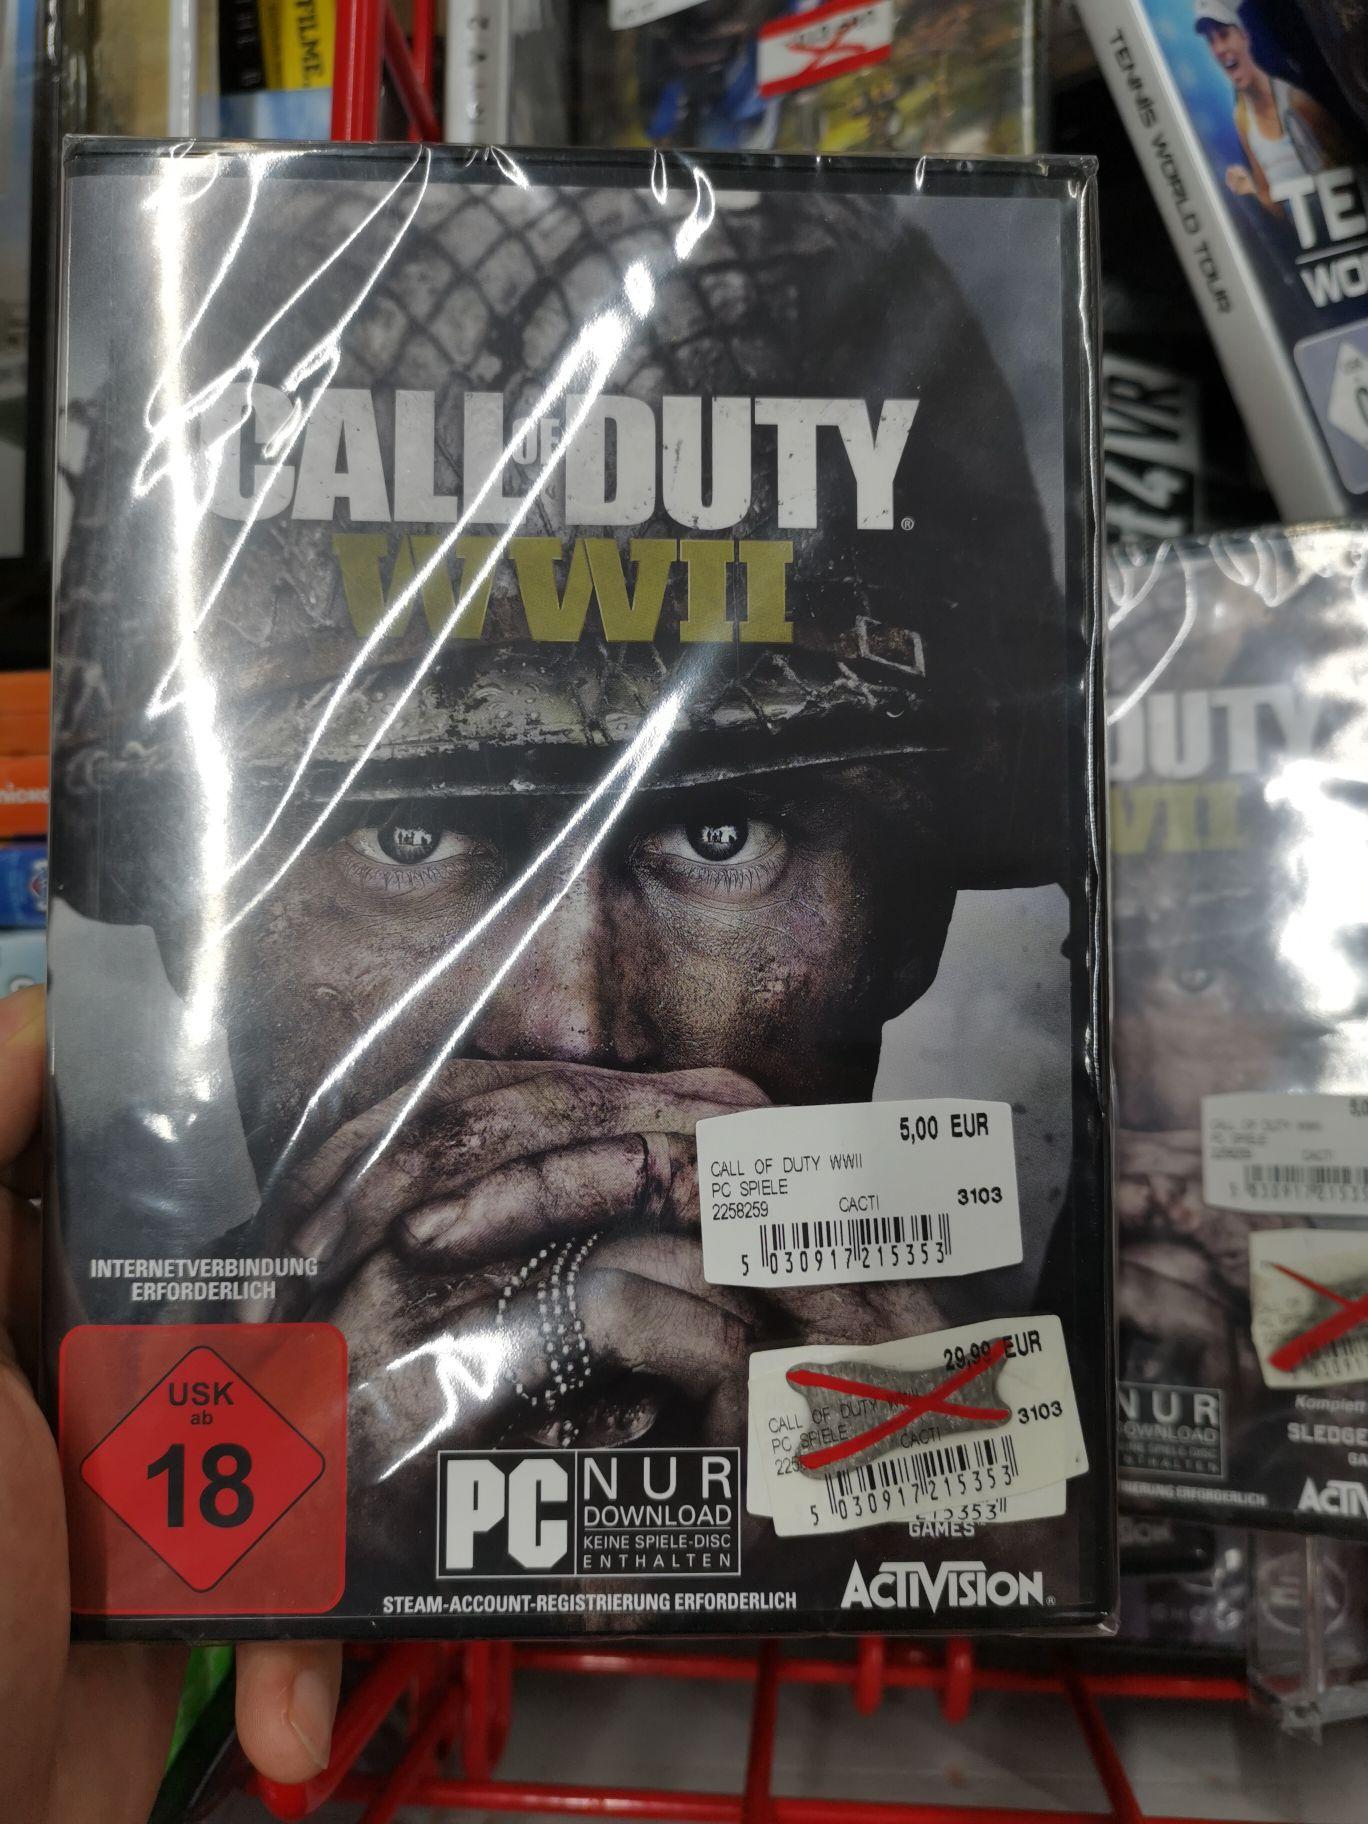 Lokal Call of Duty WWII (PC) Media Markt Berlin Charlottenburg